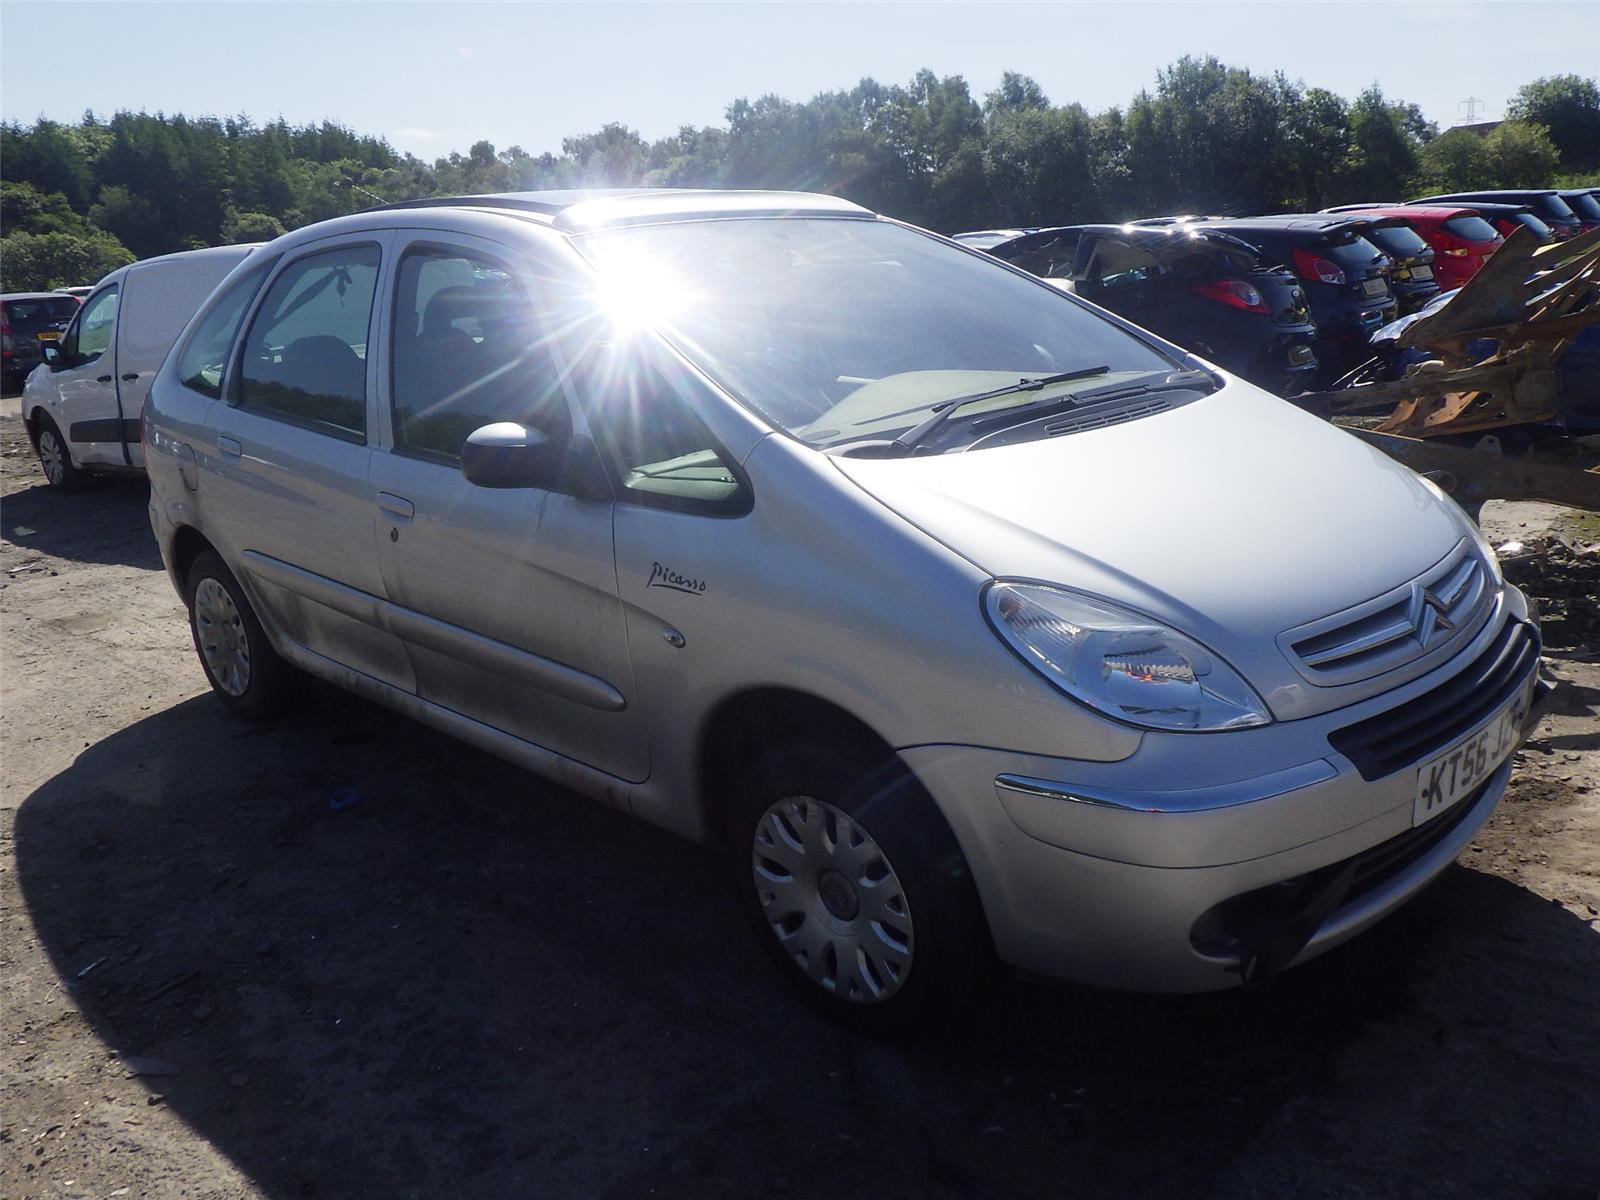 2007 Citroen Xsara Picasso 2000 To 2010 Desire HDi 1.6l Manual Diesel Car  Alternator